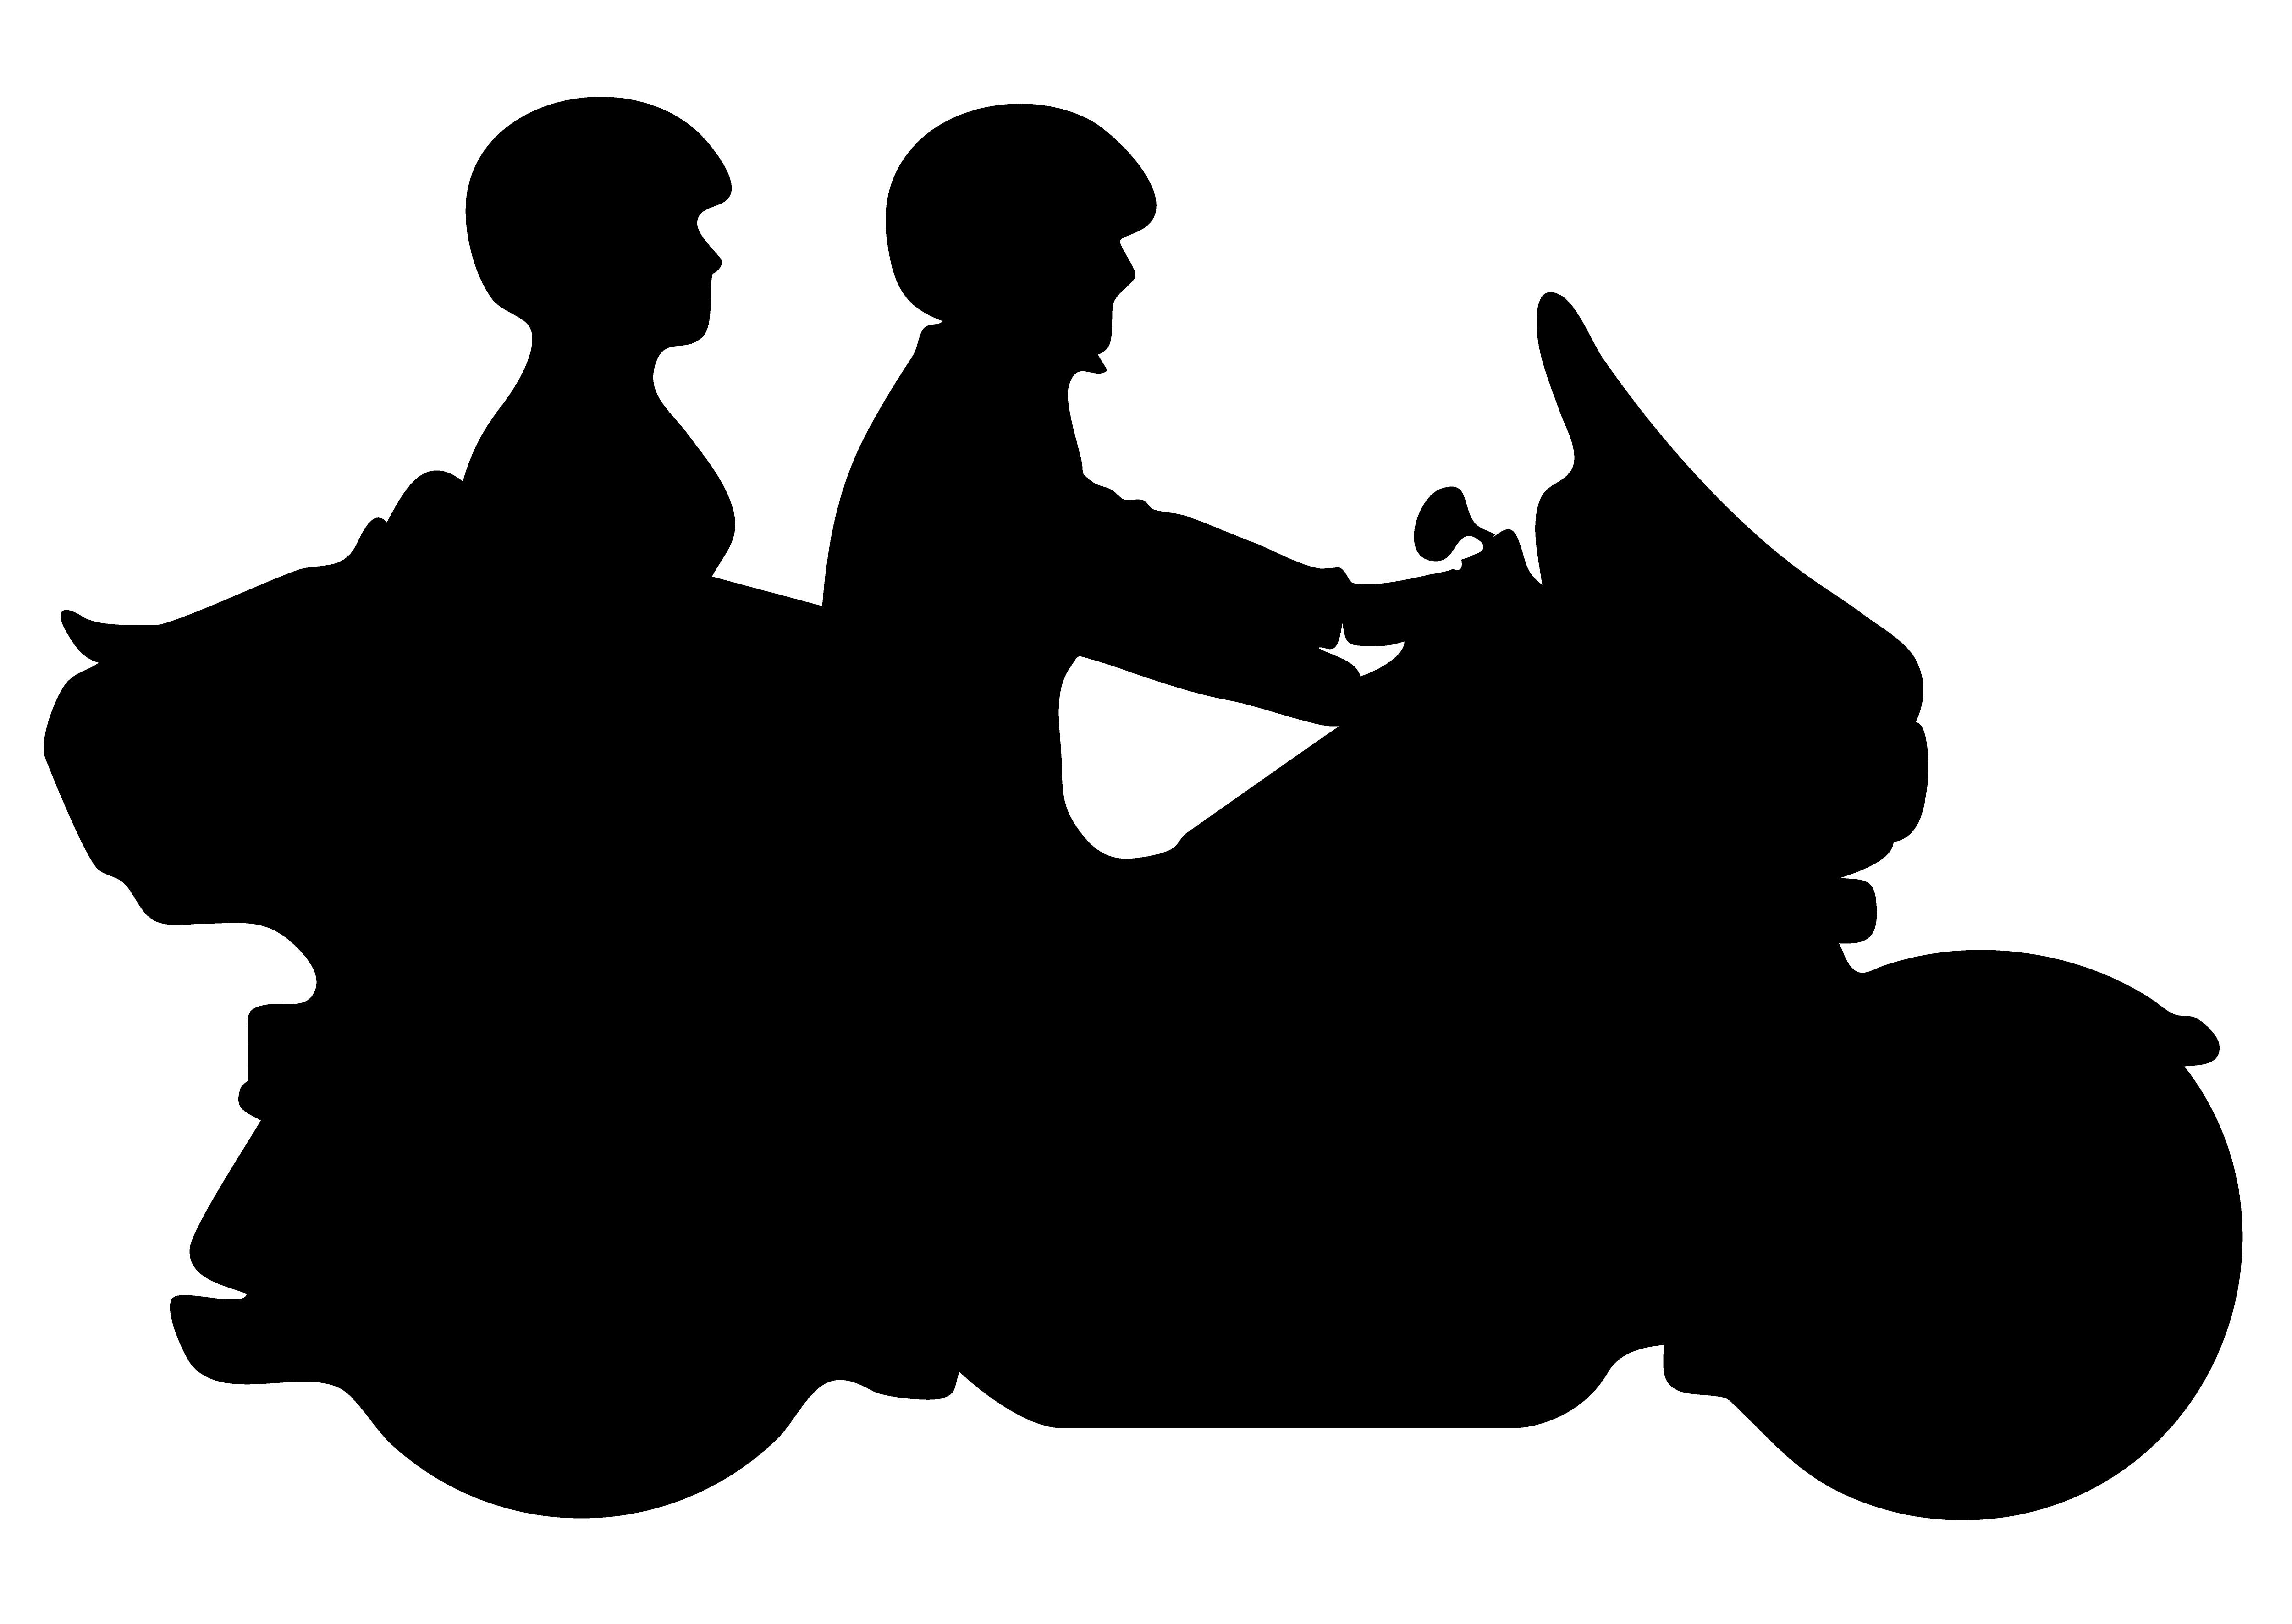 Motocross Cartoon Images, Stock Photos & Vectors | Shutterstock